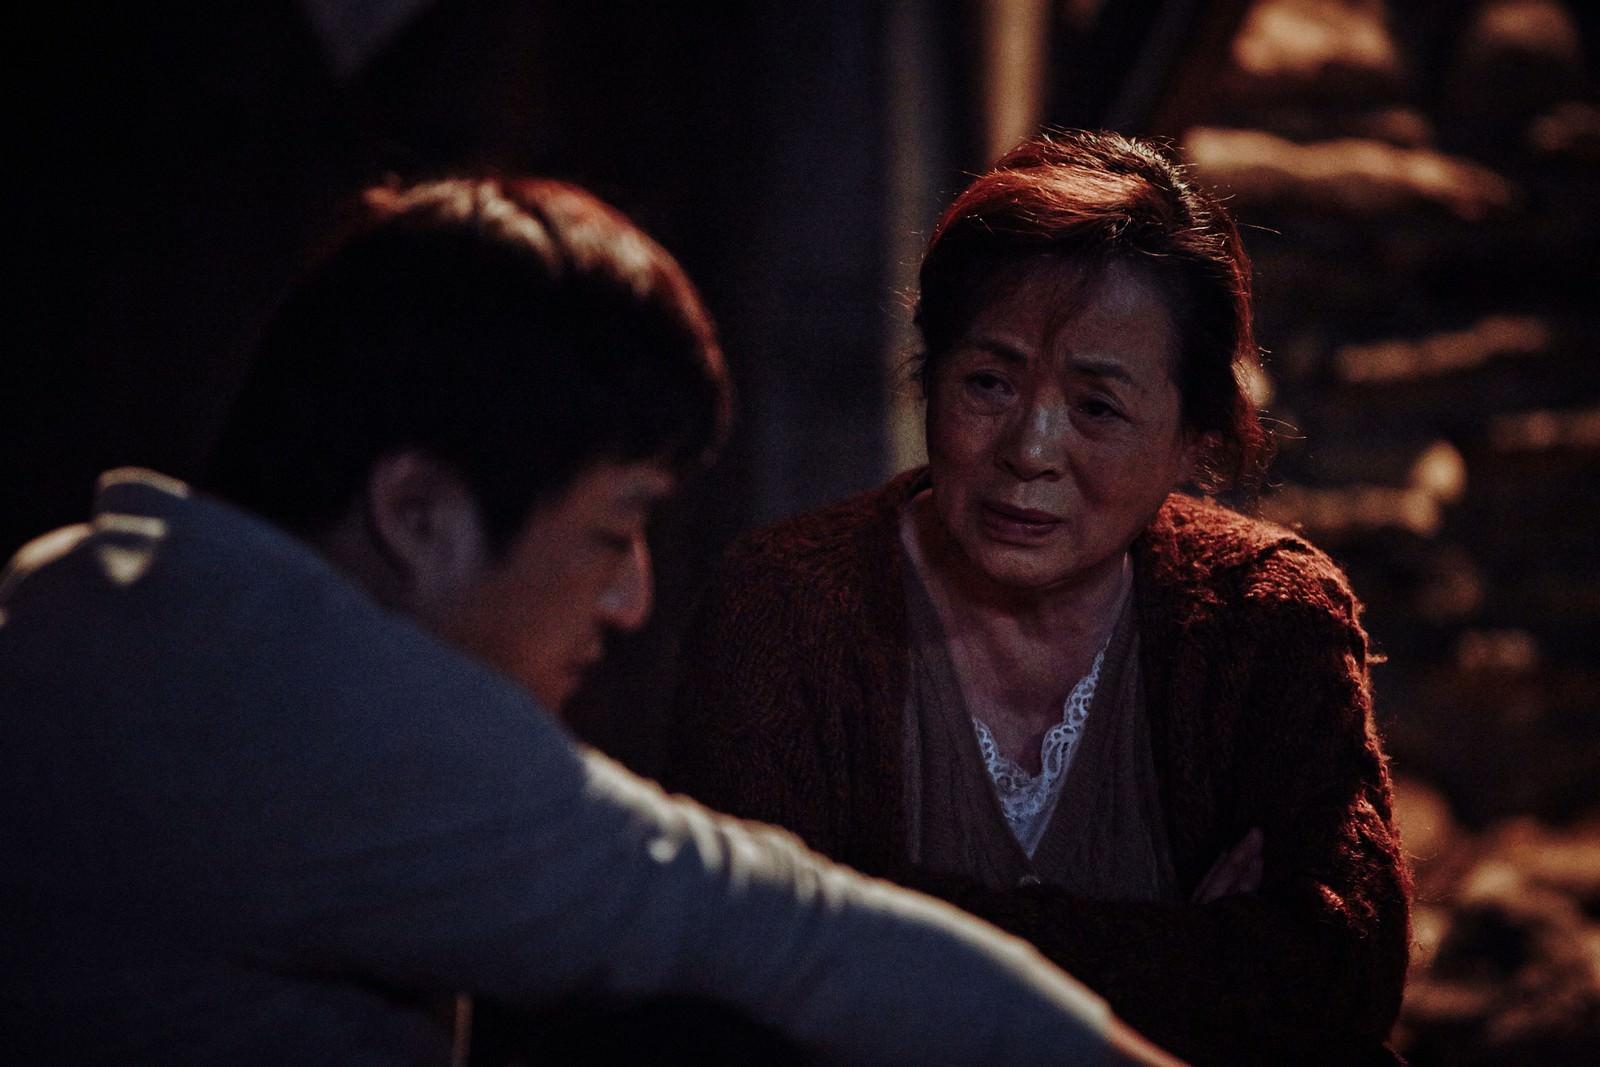 Movie, 곡성(韓國, 2016年) / 哭聲(台灣) / The Wailing(英文), 電影劇照, 角色與演員介紹